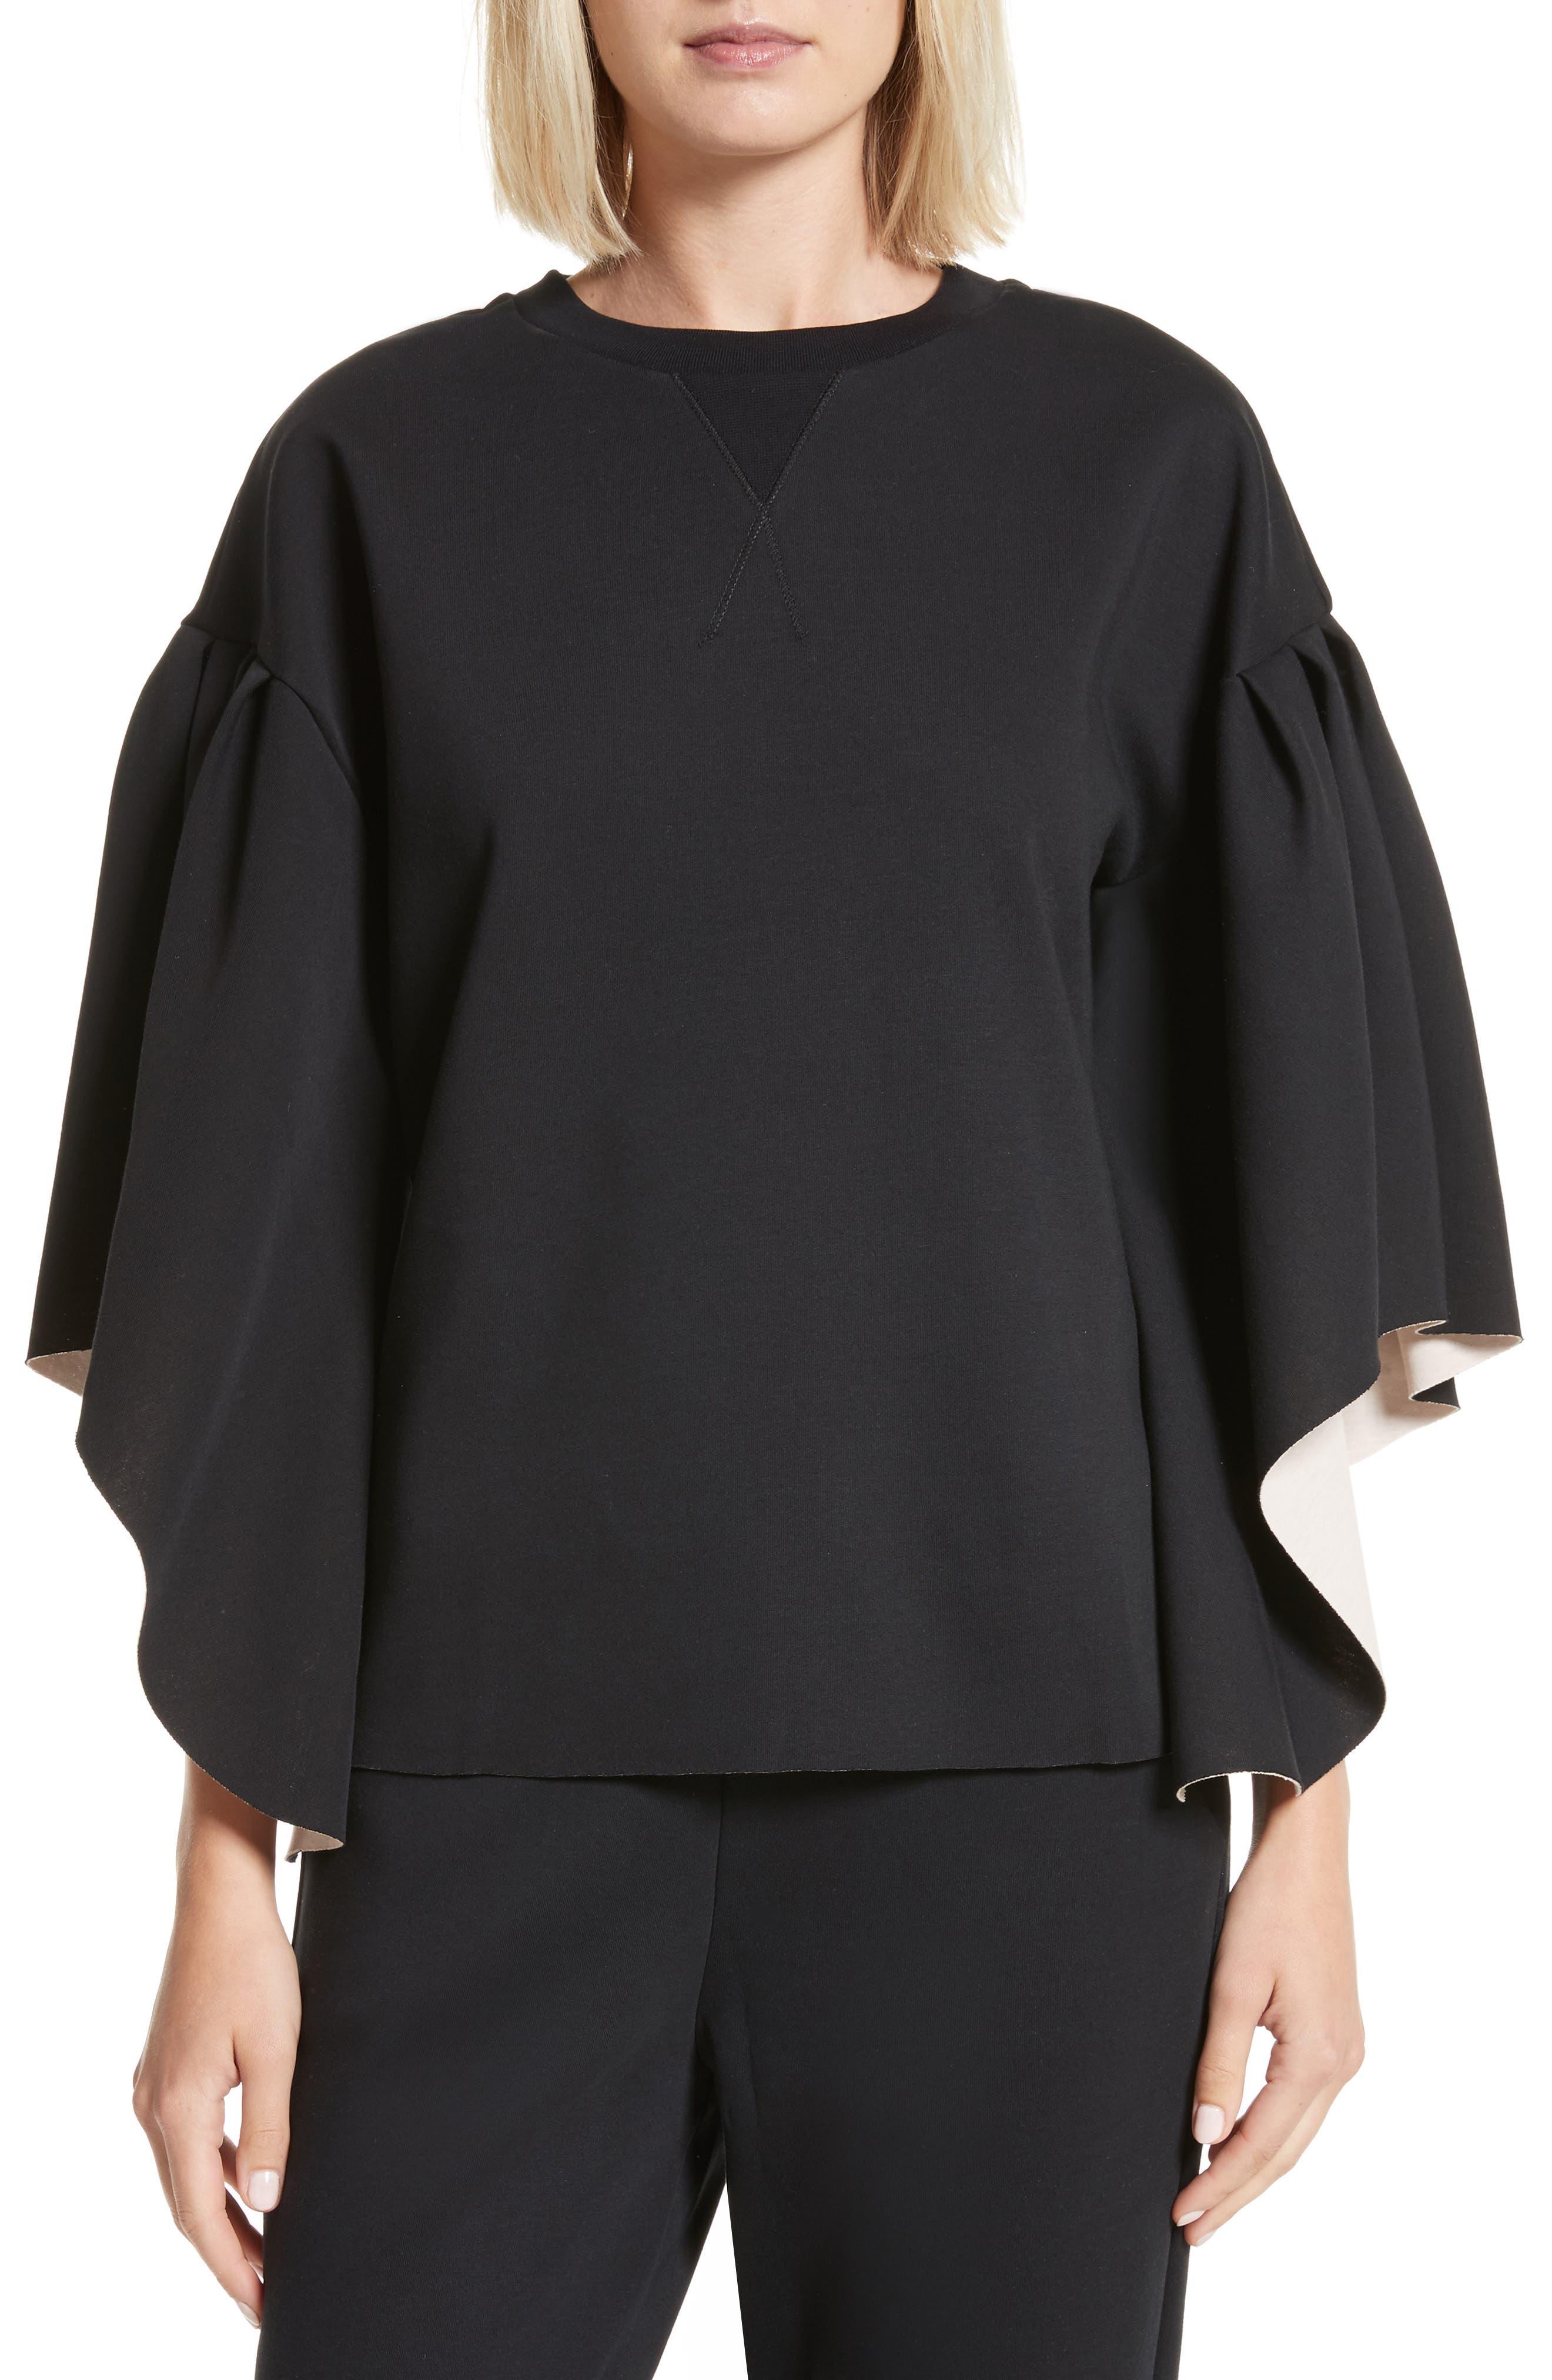 Orcher Full Sleeve Sweatshirt,                         Main,                         color, 001